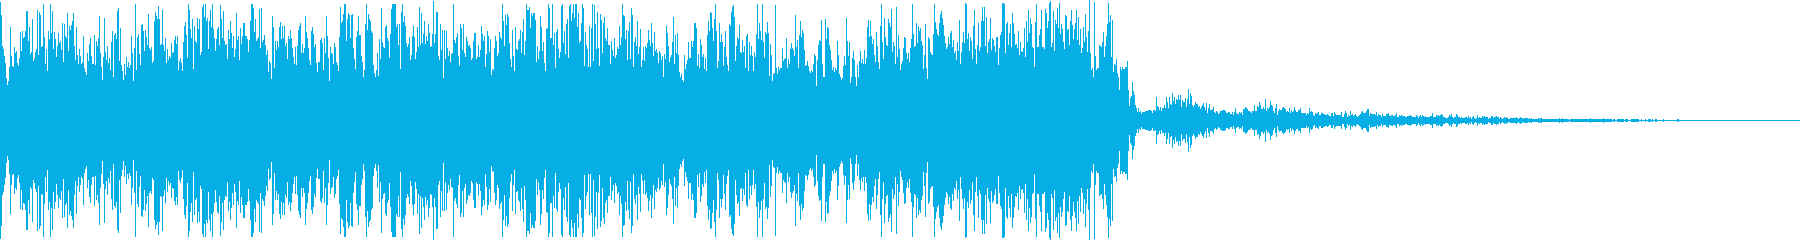 【JG】緊迫感のあるジングル02の再生済みの波形